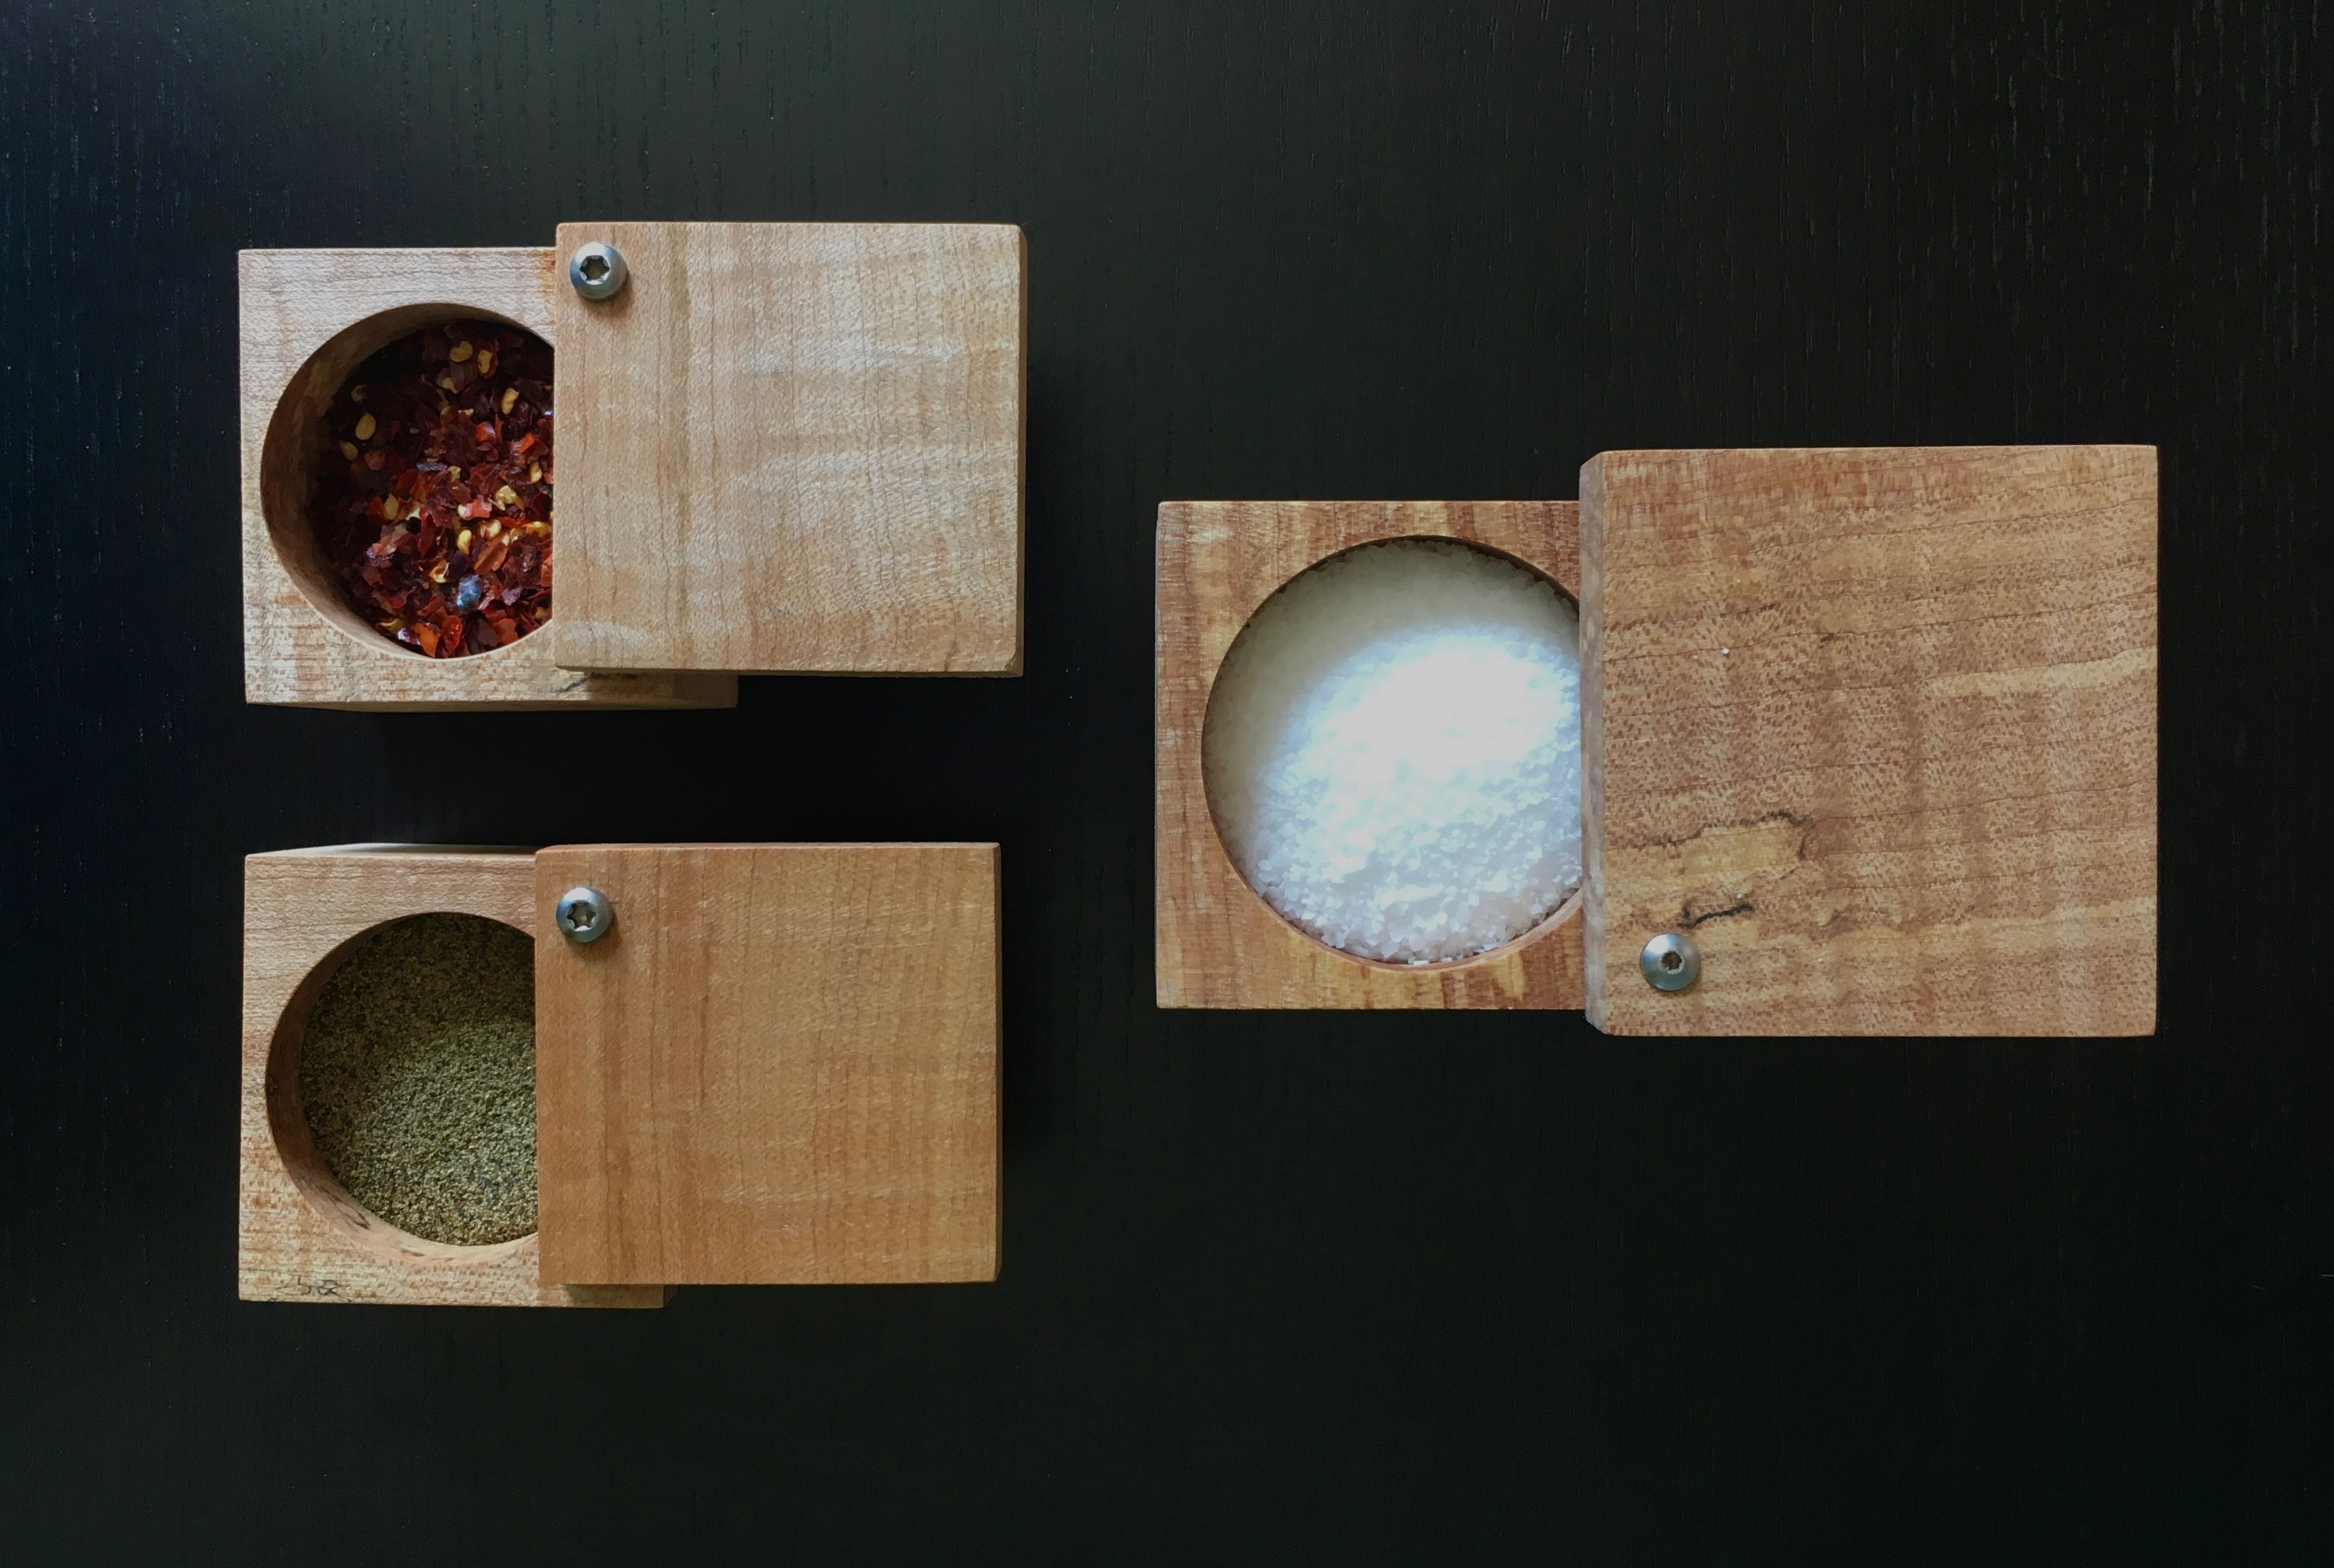 Spice Cellars